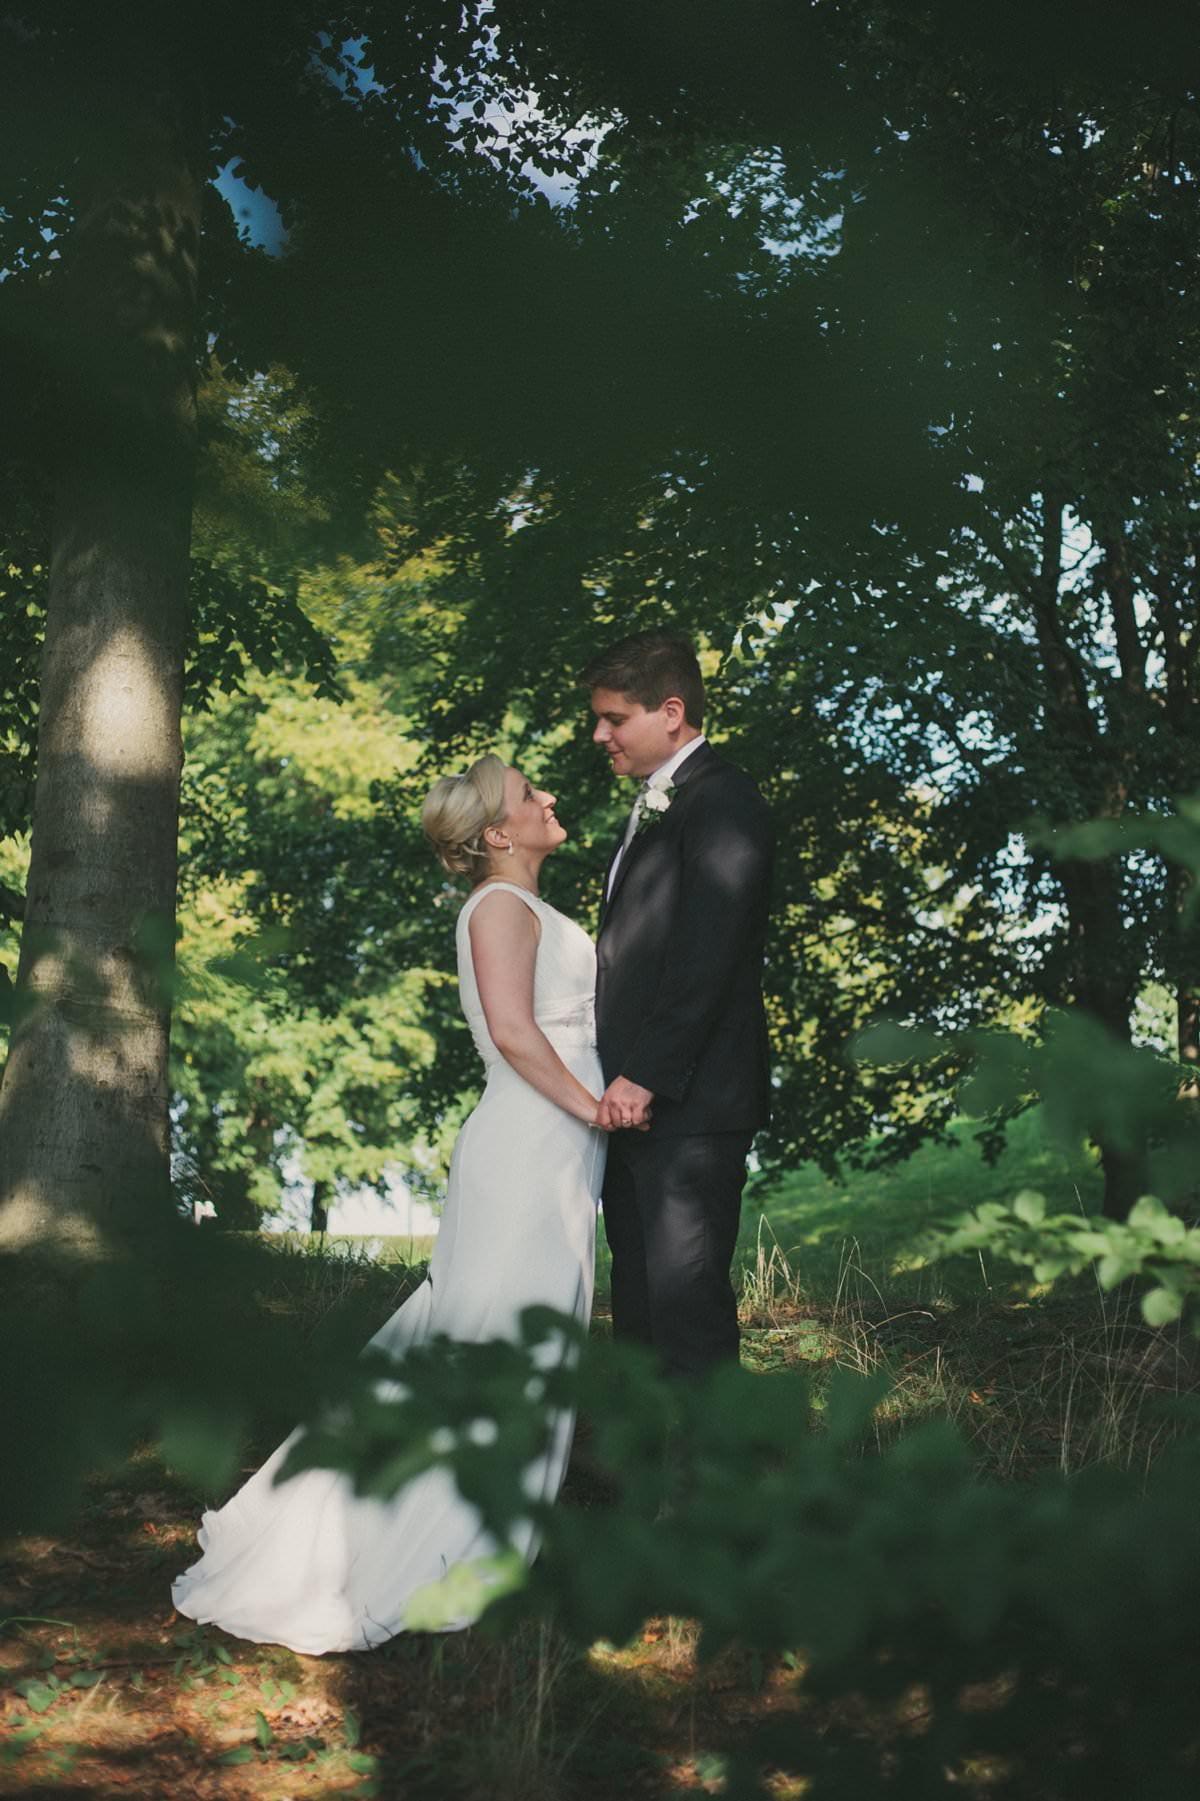 fine-art-destination-wedding-photography-bonn-germany-078